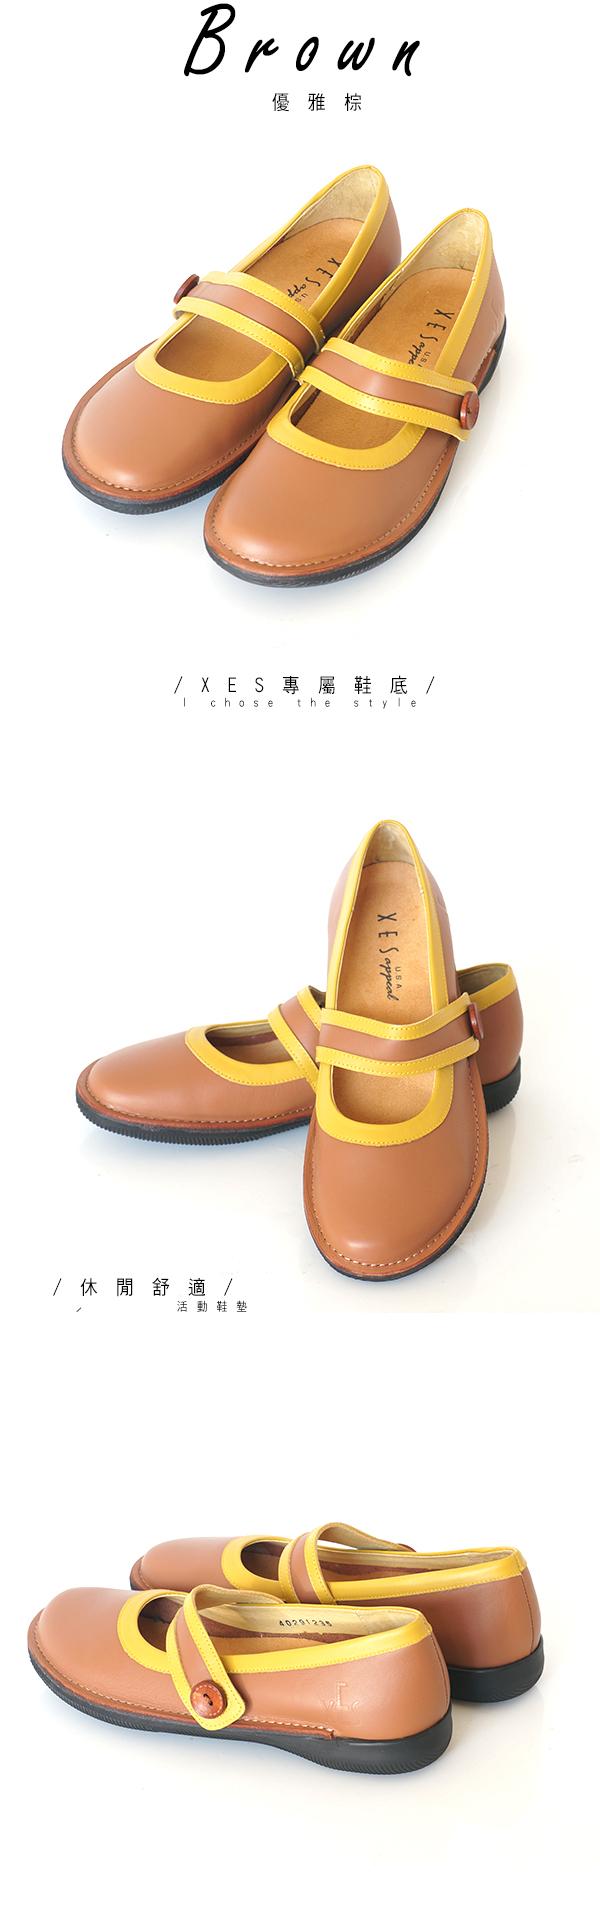 xes,休閒鞋,雷根鞋,華趯國際,優雅鞋款,舒適大方,前面圓頭,可愛又時尚